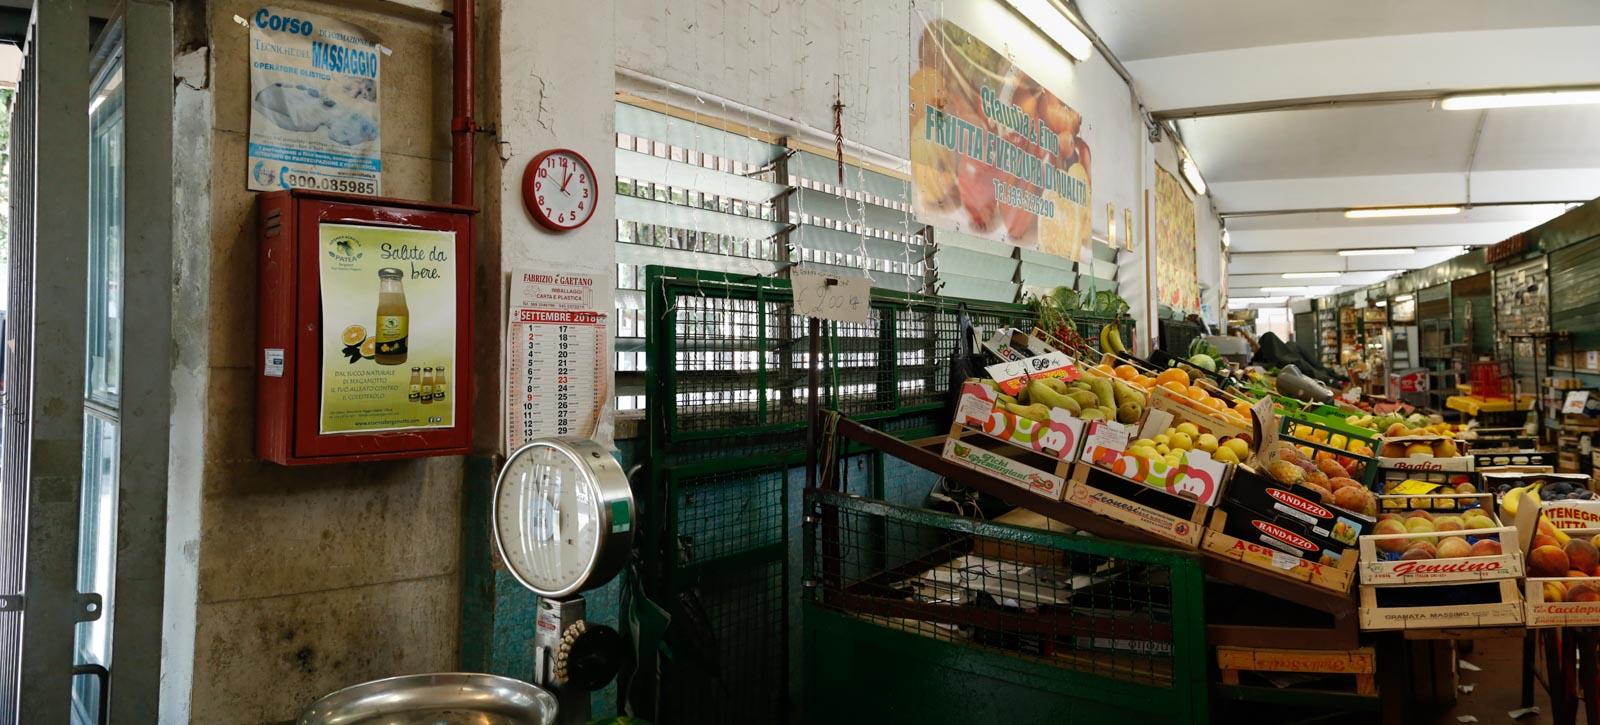 Mercato Montesacro interno ingresso prima dei lavori